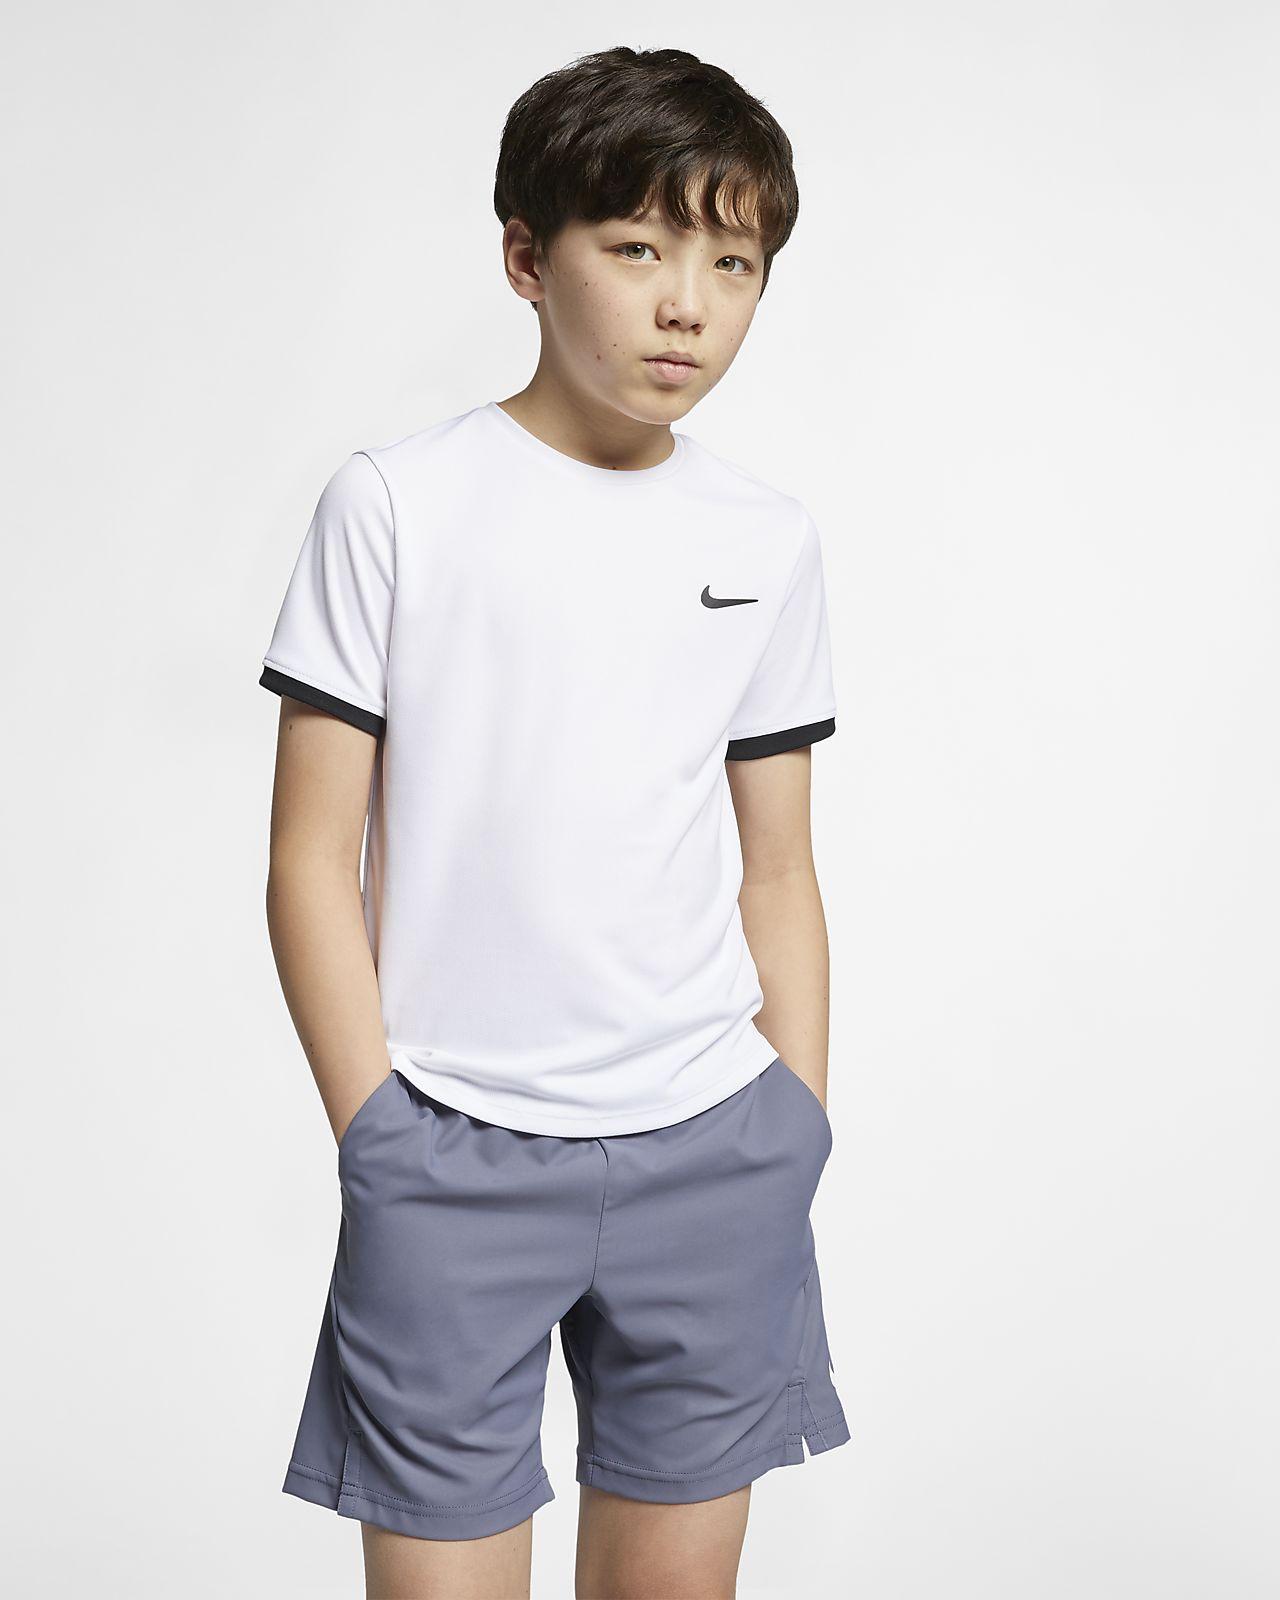 Prenda para la parte superior de tenis manga corta para niño talla grande NikeCourt Dri-FIT